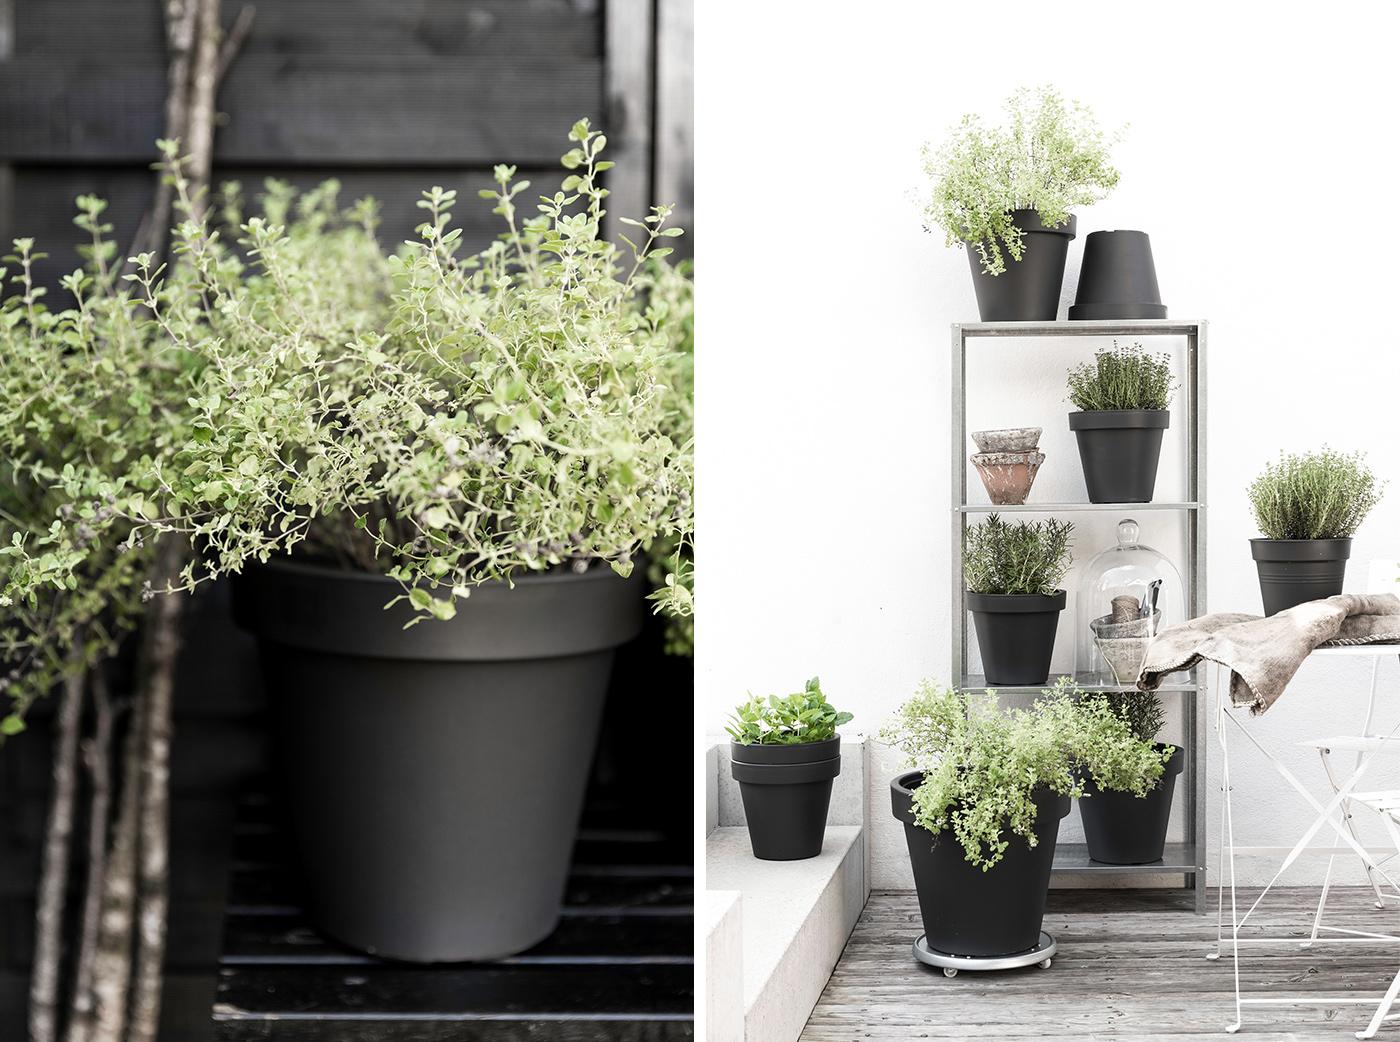 topfpflanzen winterfest 7 sch n bei dir by depot. Black Bedroom Furniture Sets. Home Design Ideas